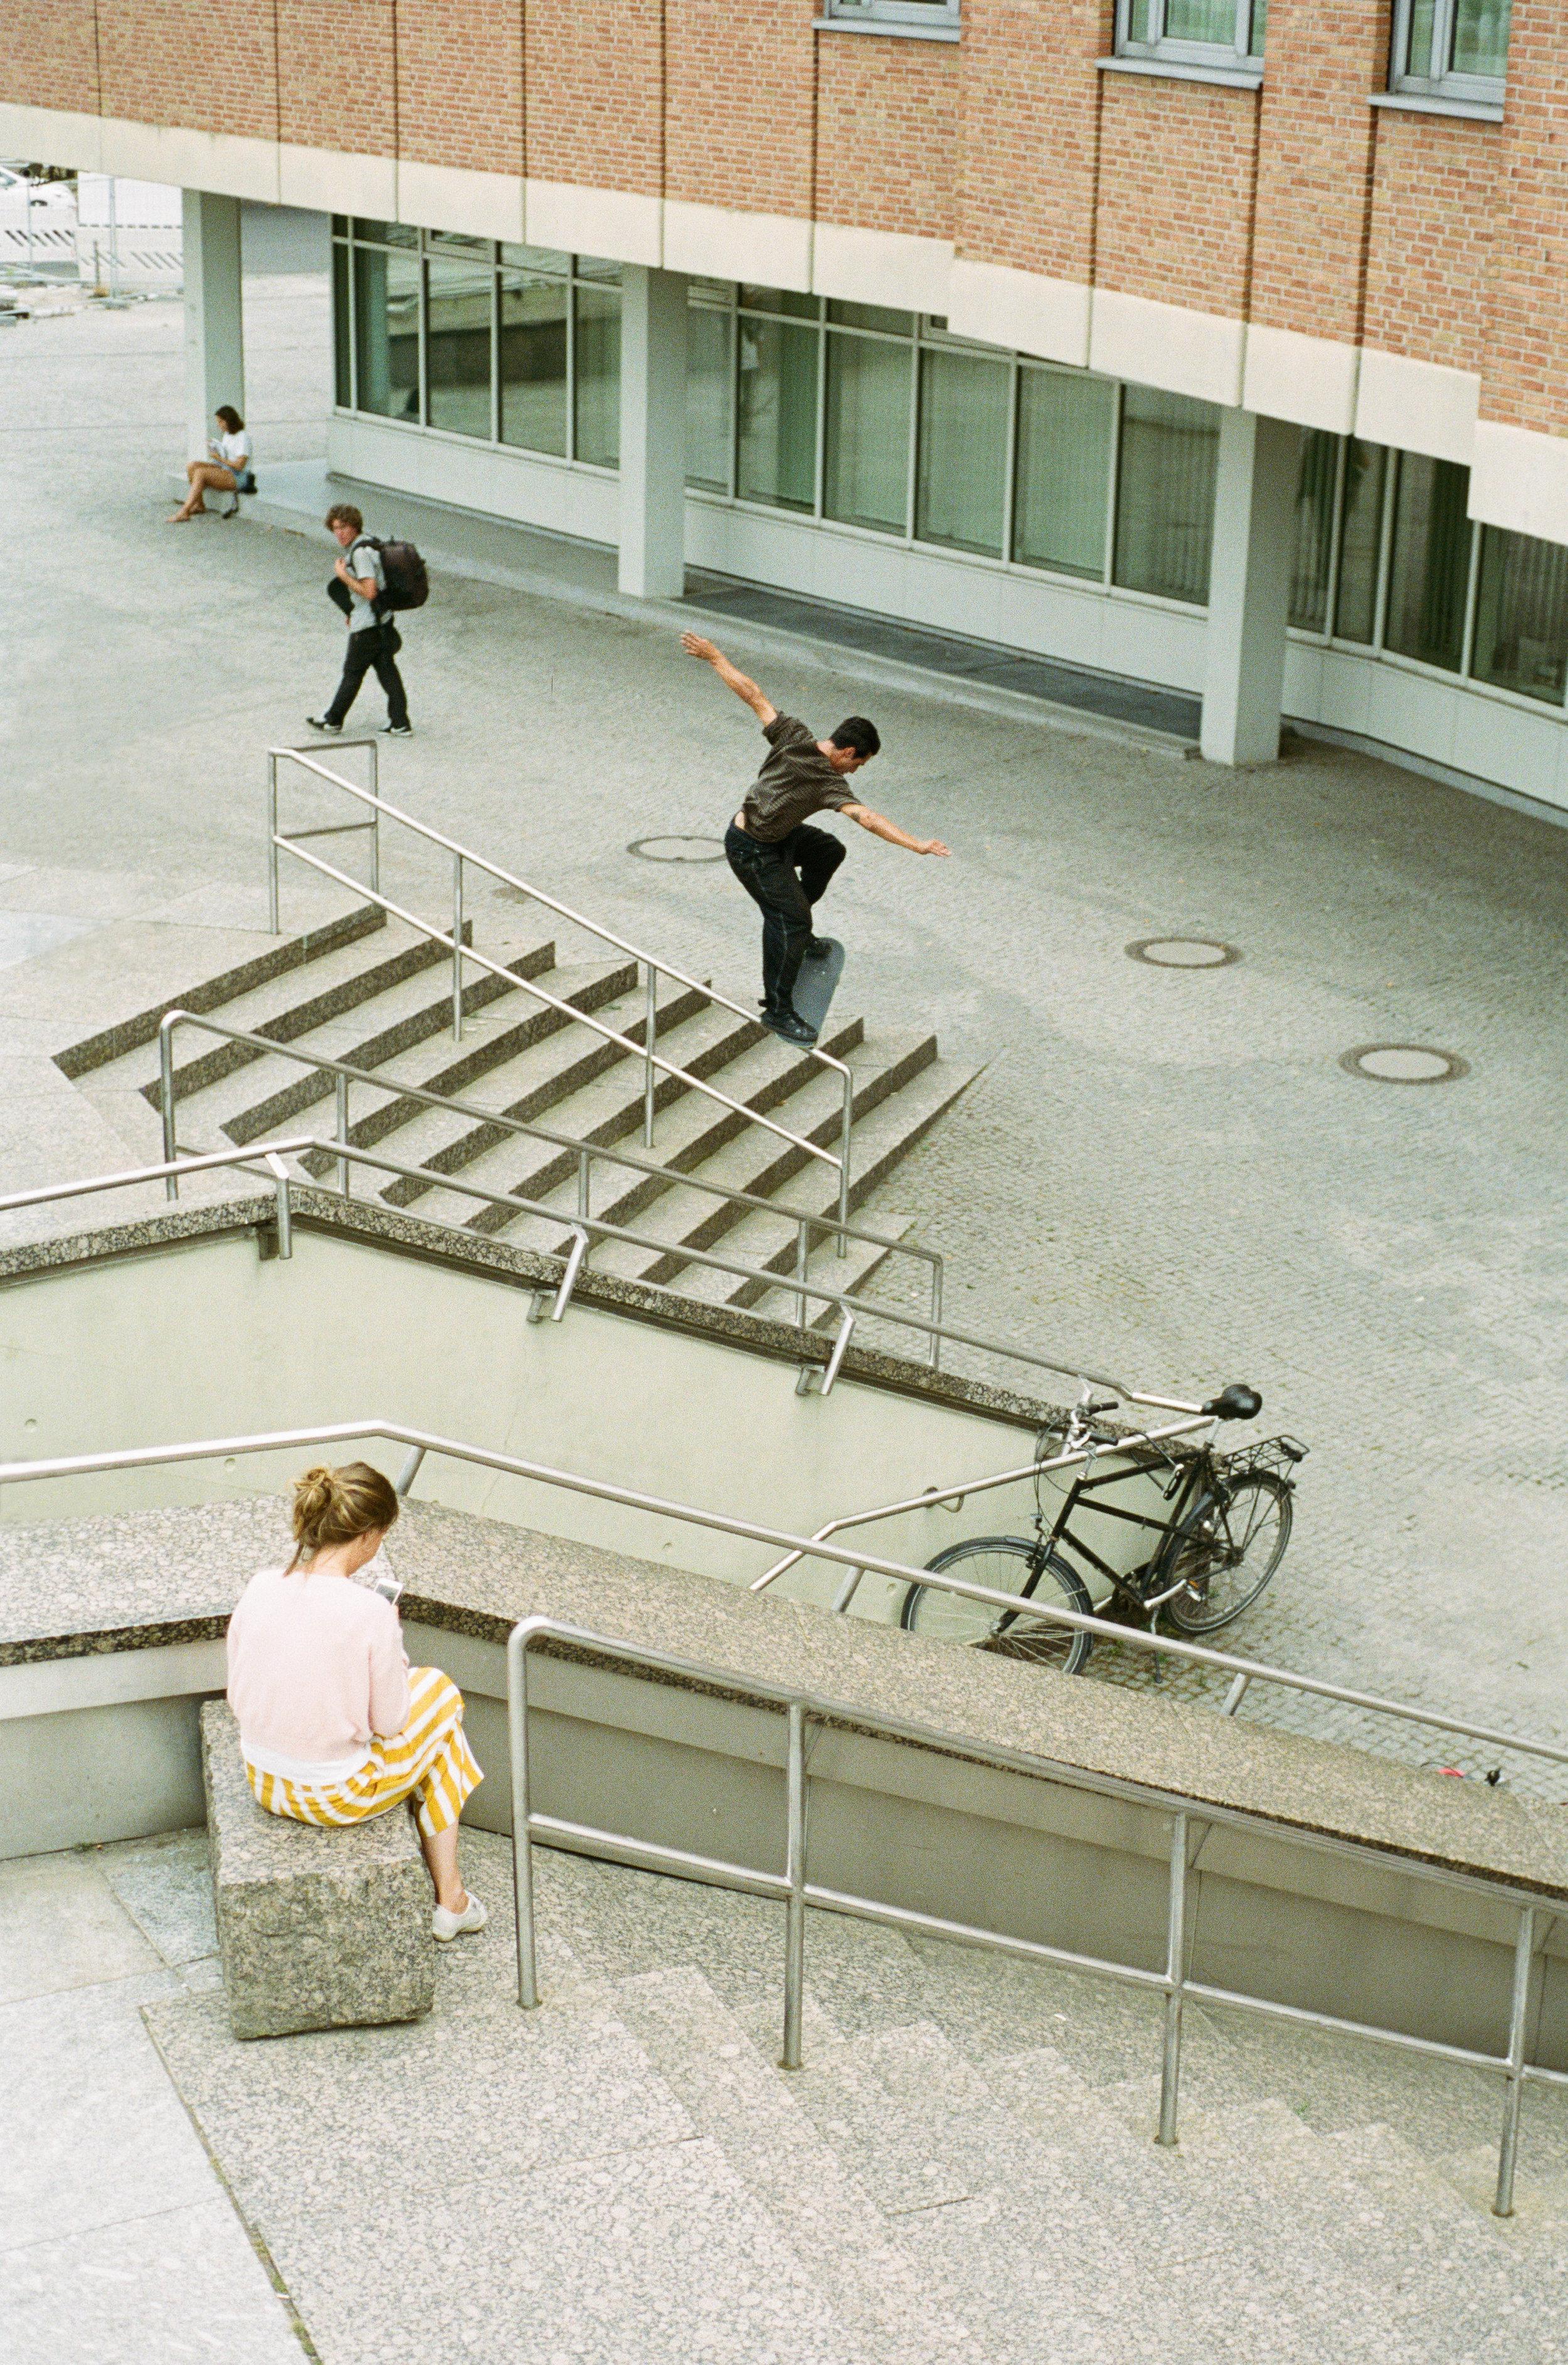 Noseblunt at Kulturforum, Berlin. Photo: Yentl Touboul.